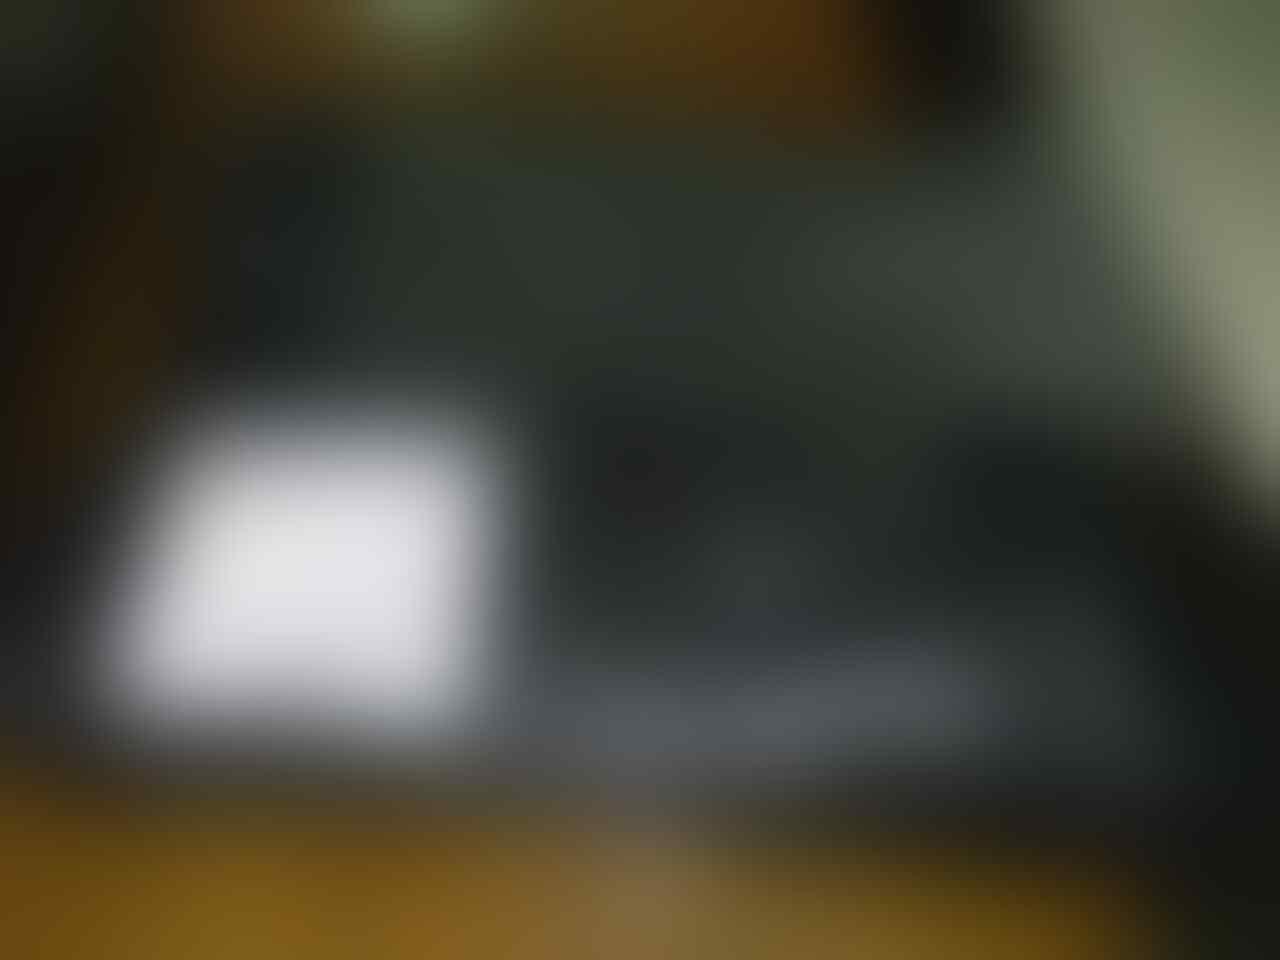 COOLER MASTER NOTEPAL C2 / CMC3 / U2 / ERGOSTAND ALAS PENDINGIN / COOLING PAD LAPTOP